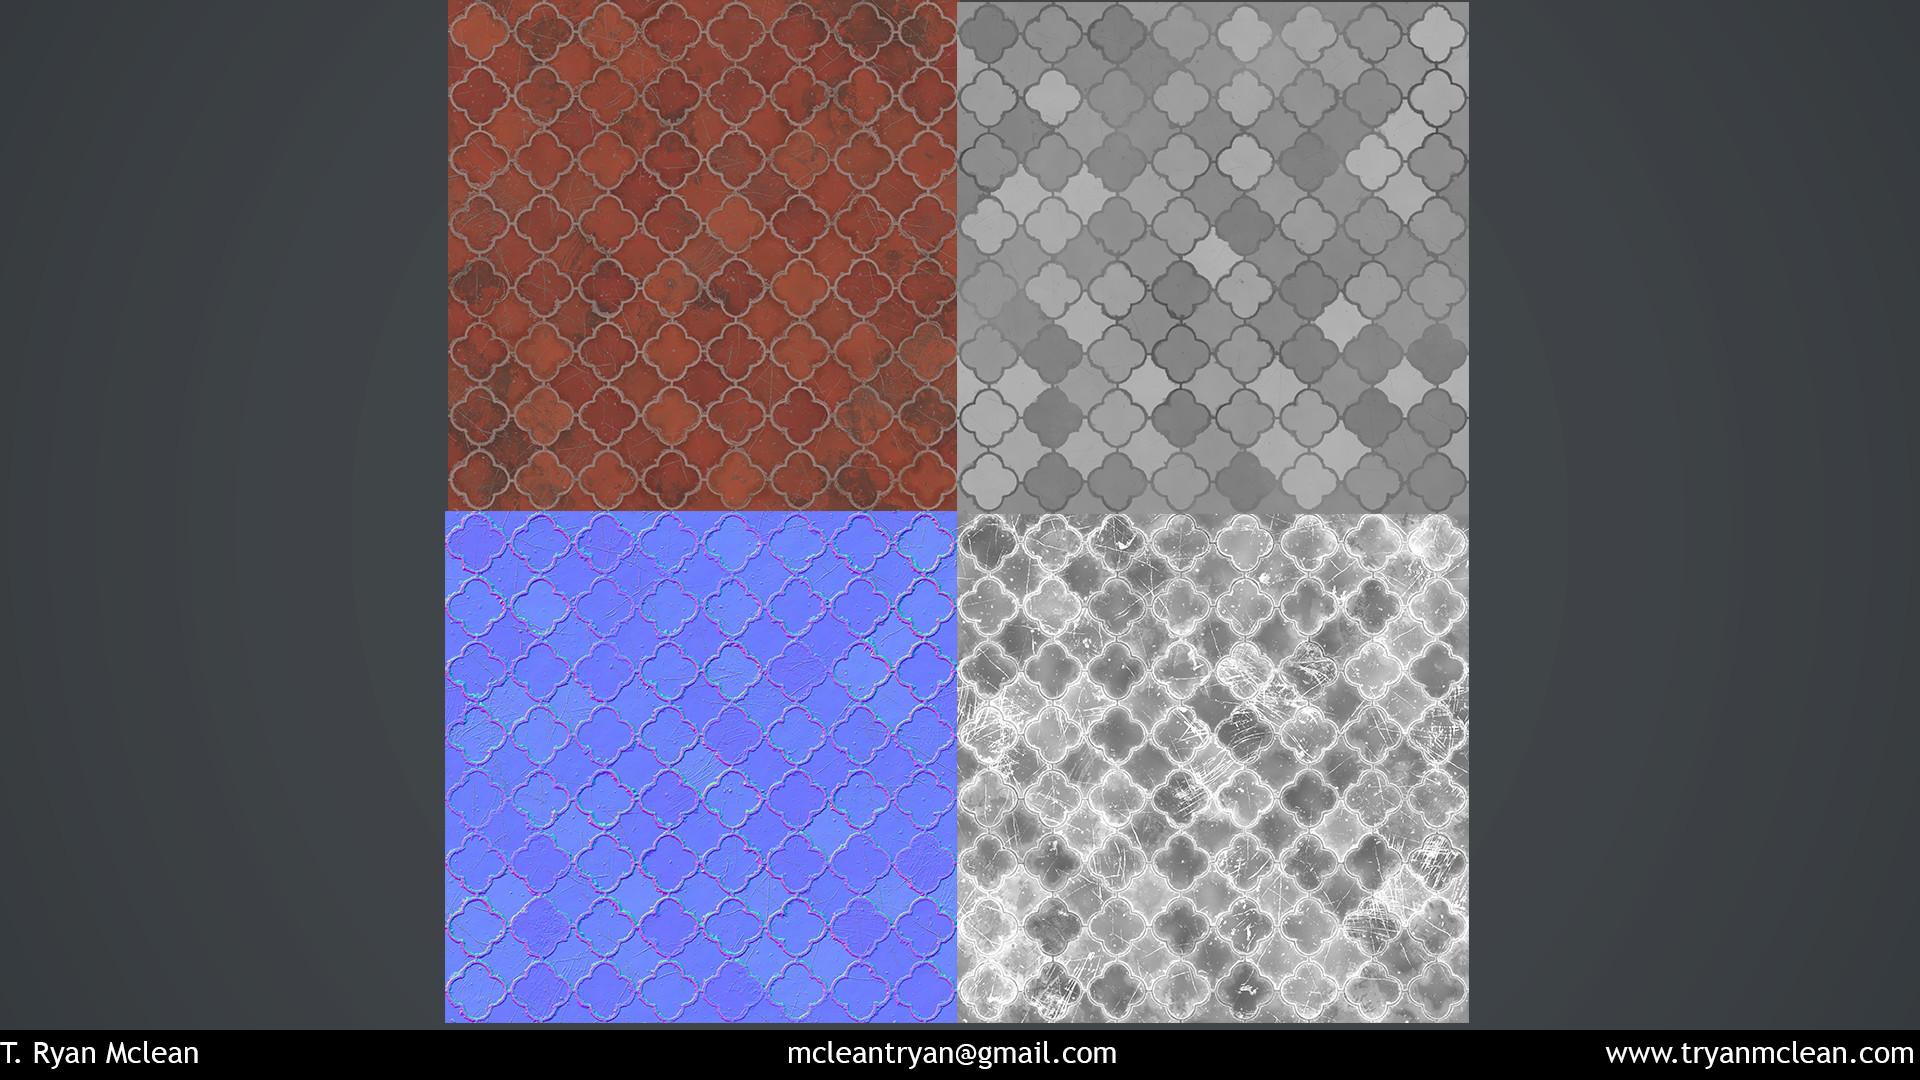 T ryan mclean terracotta tiles 01